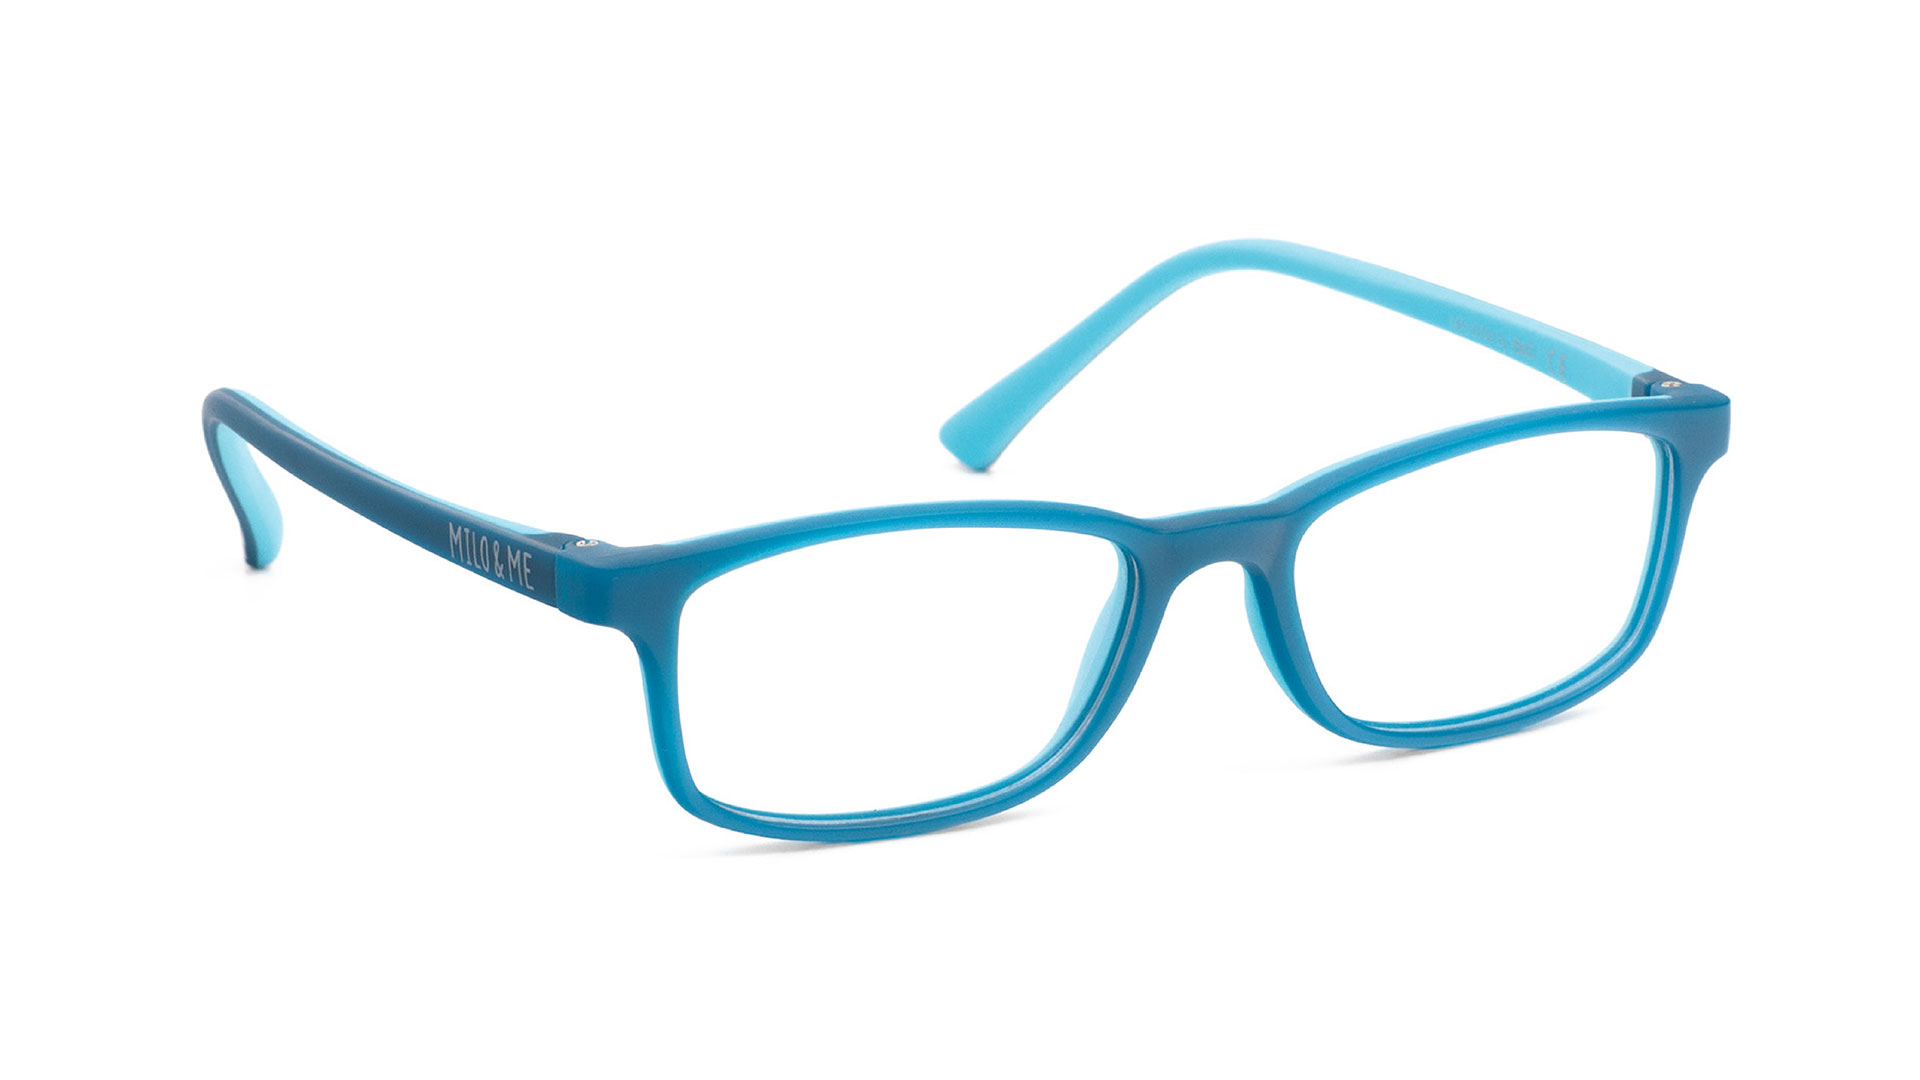 Turquoise Light Turquoise H85030-04 - Milo & Me Eyewear - Optimum RX Lens Specialists